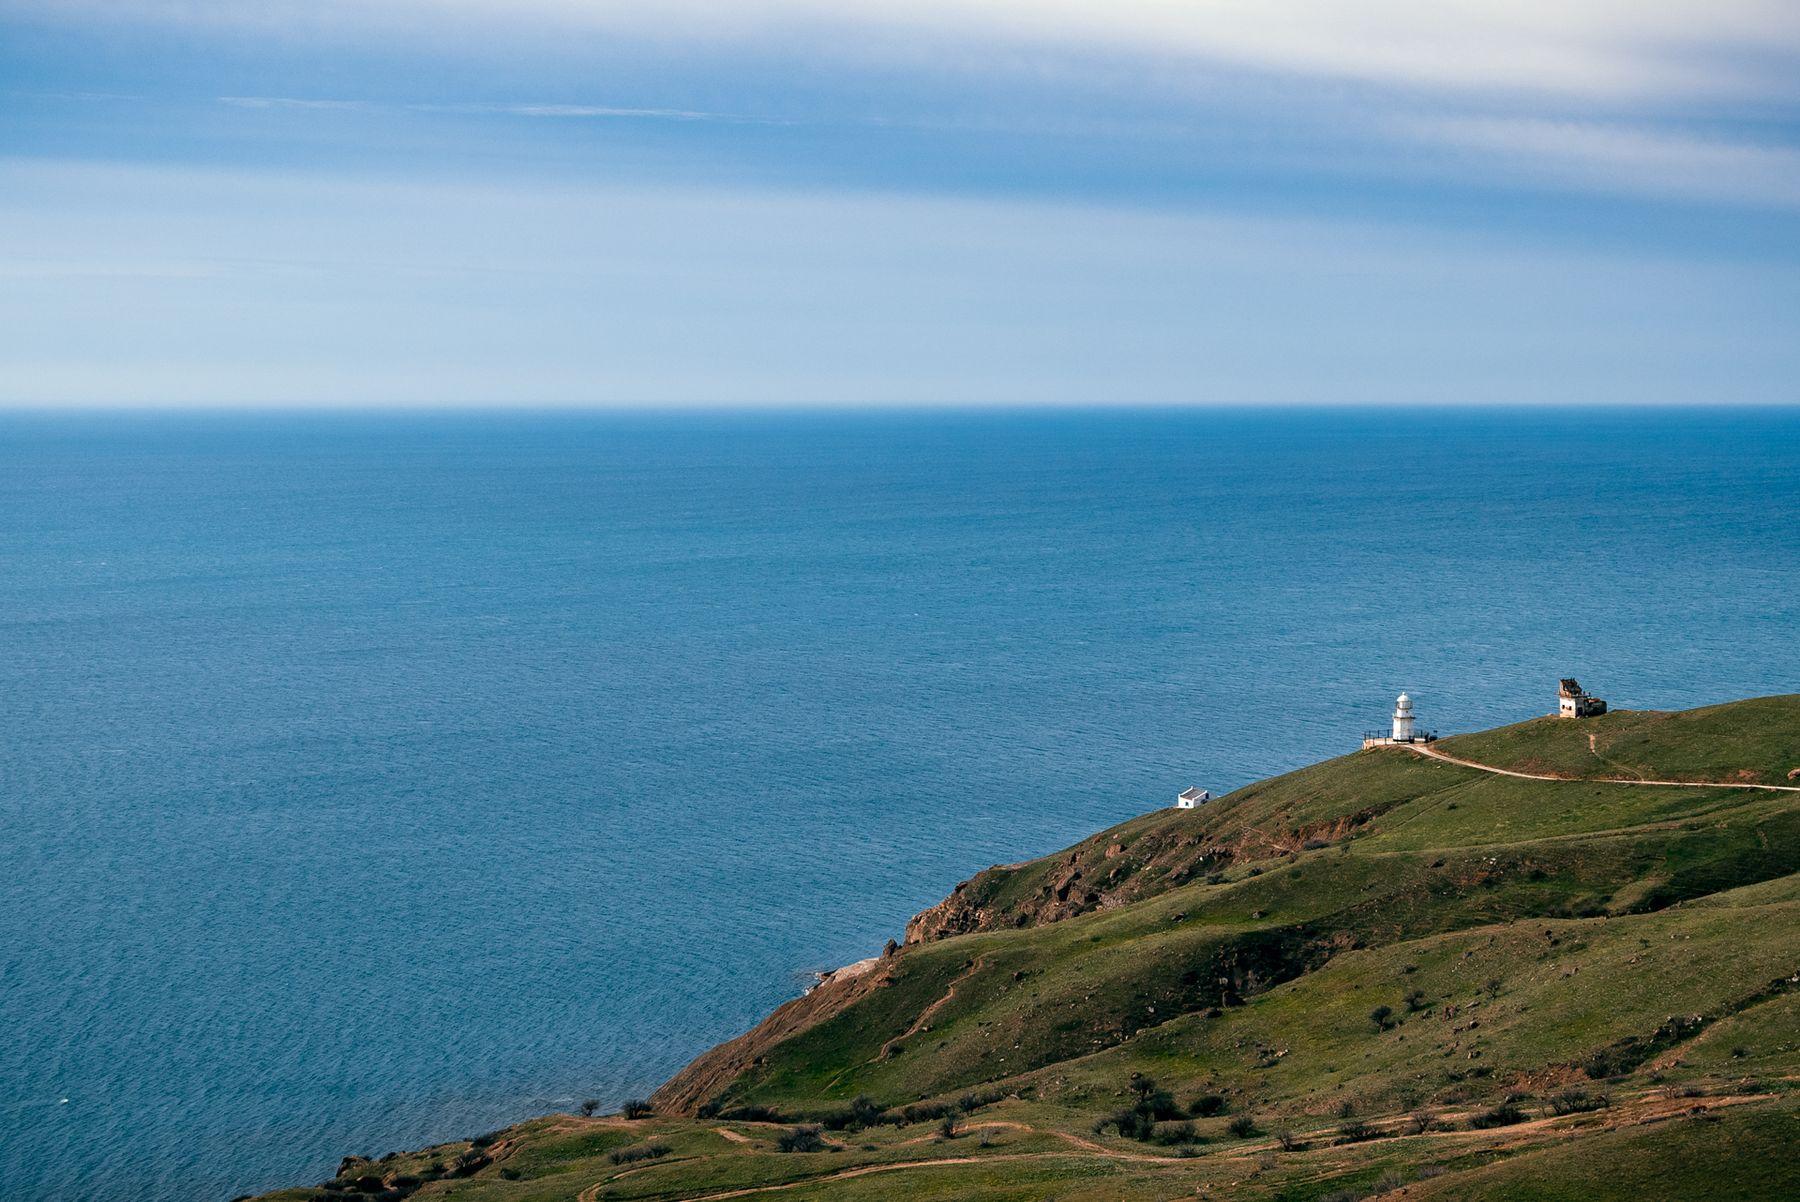 Крым, маяк на мысе Меганом